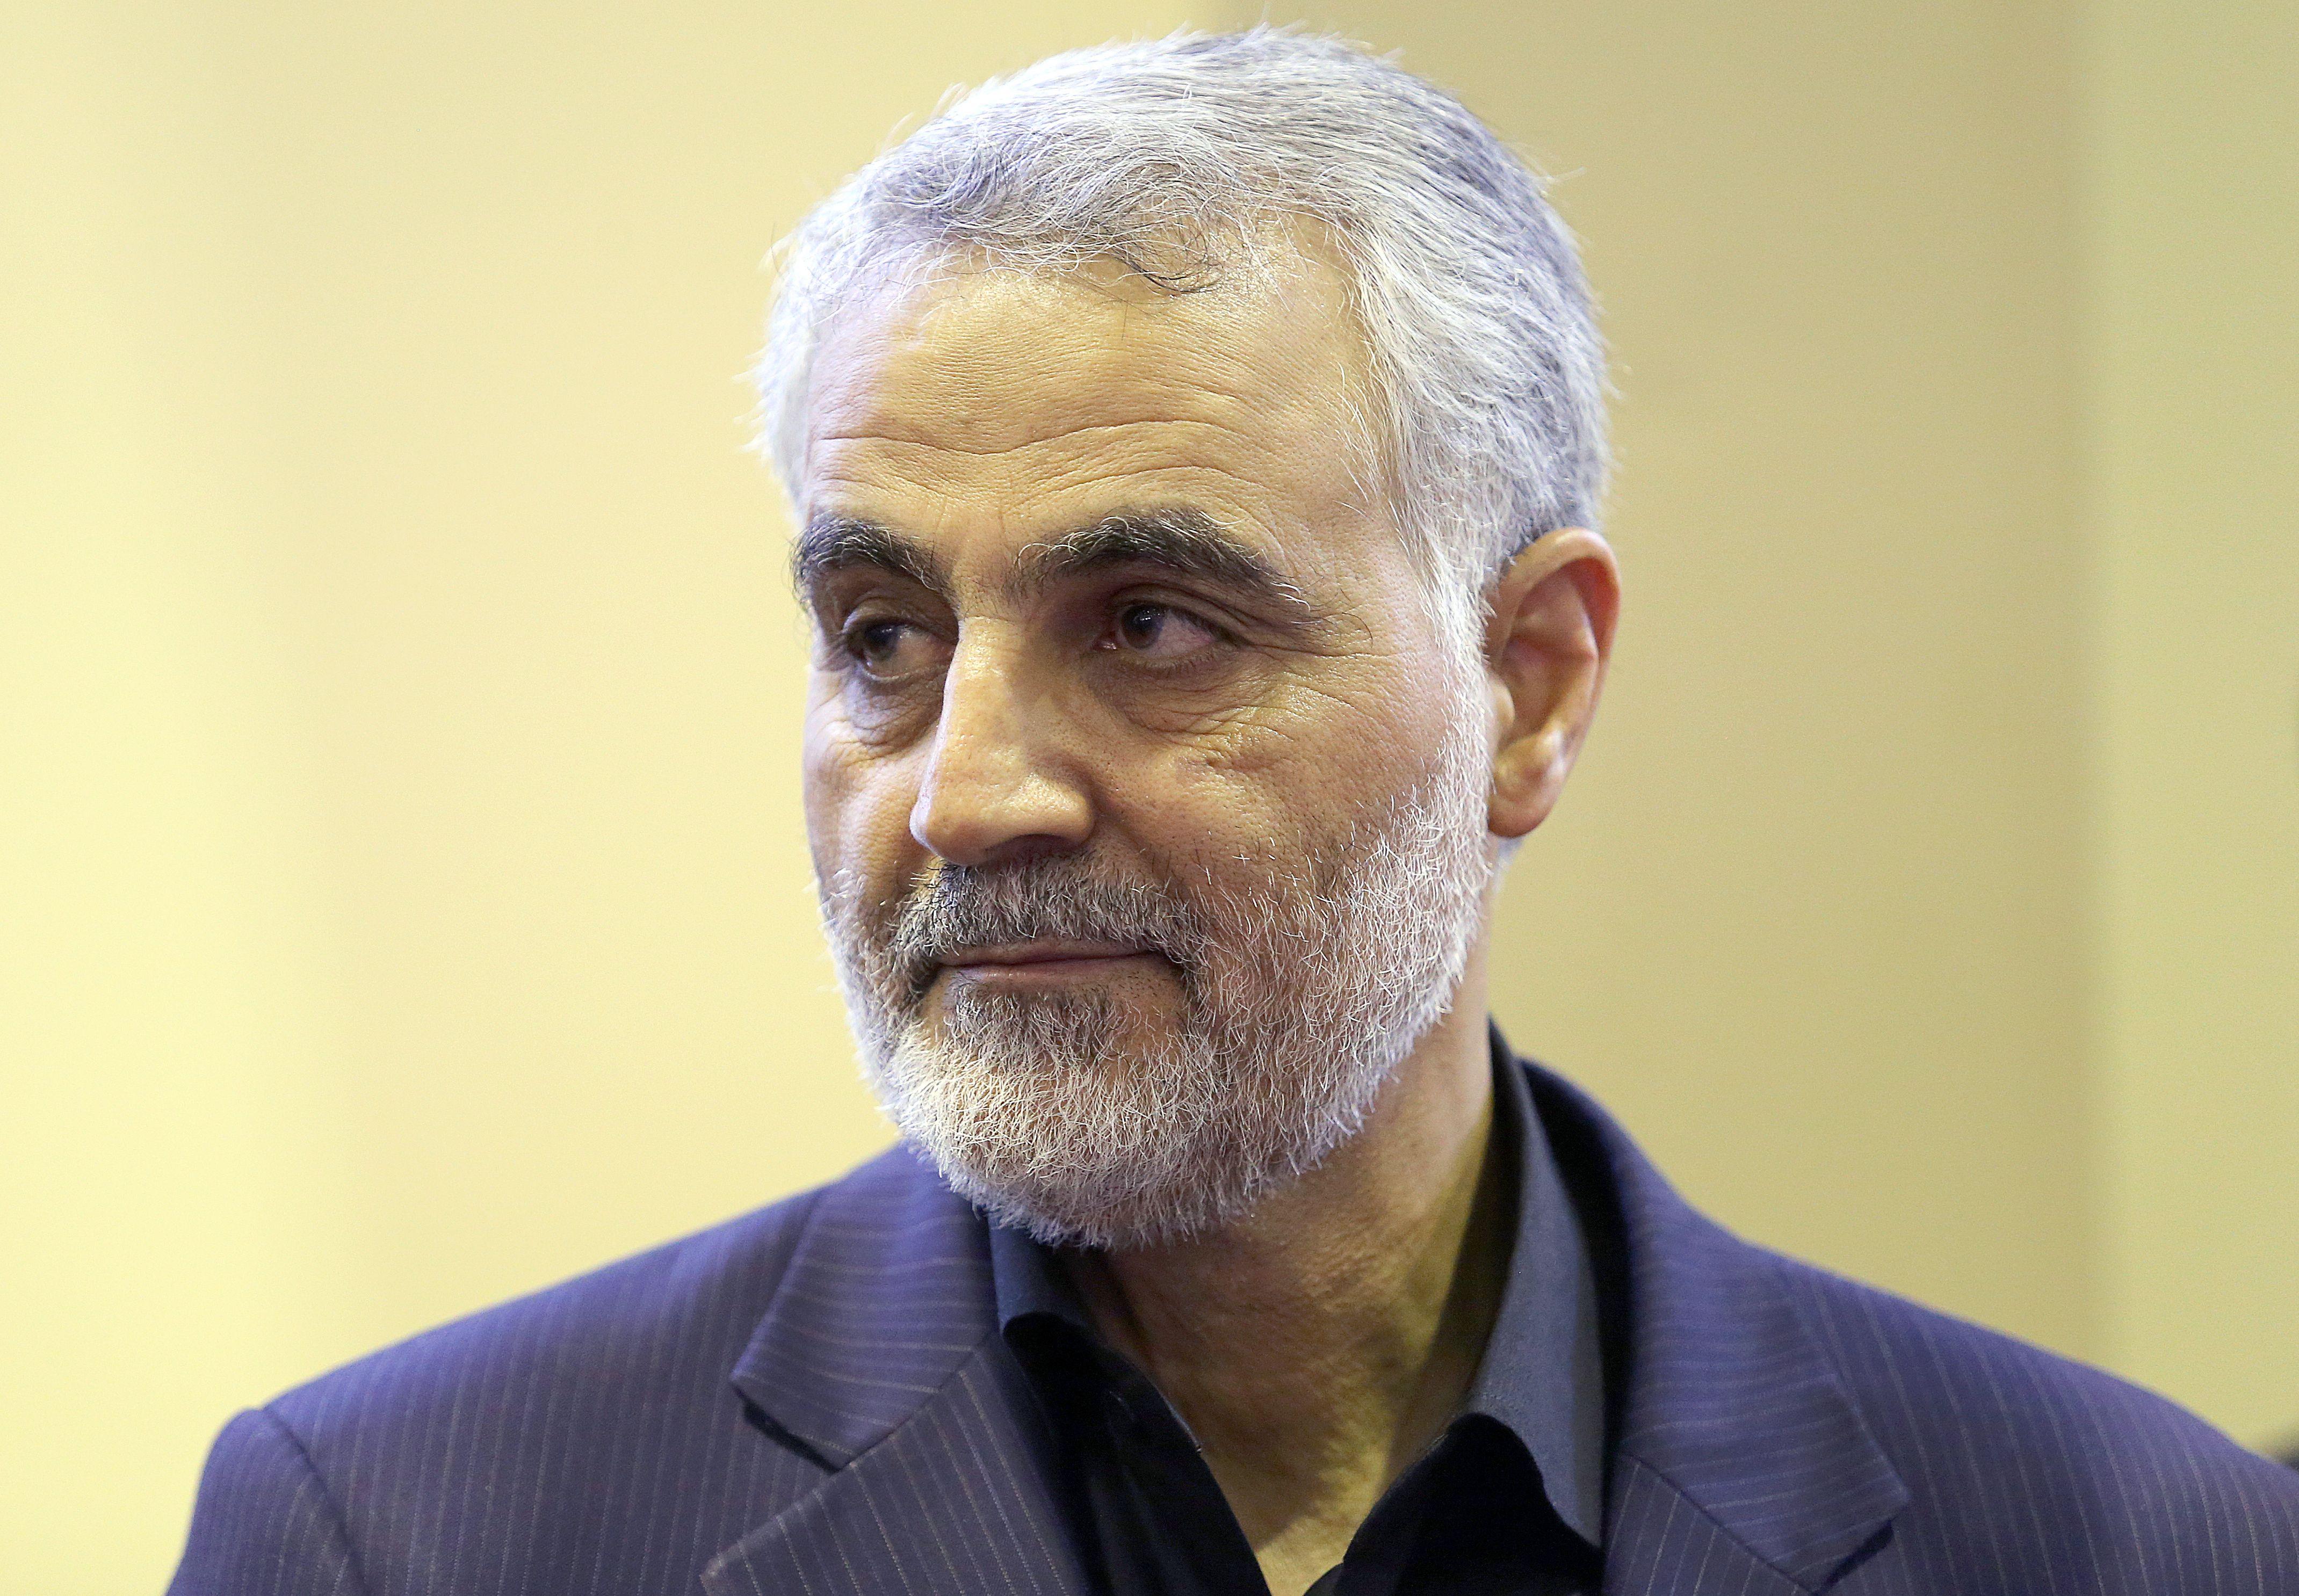 Qasem Soleimani, the commander of Iran's Islamic Revolutionary Guards Corps (IRGC) Quds Force unit.